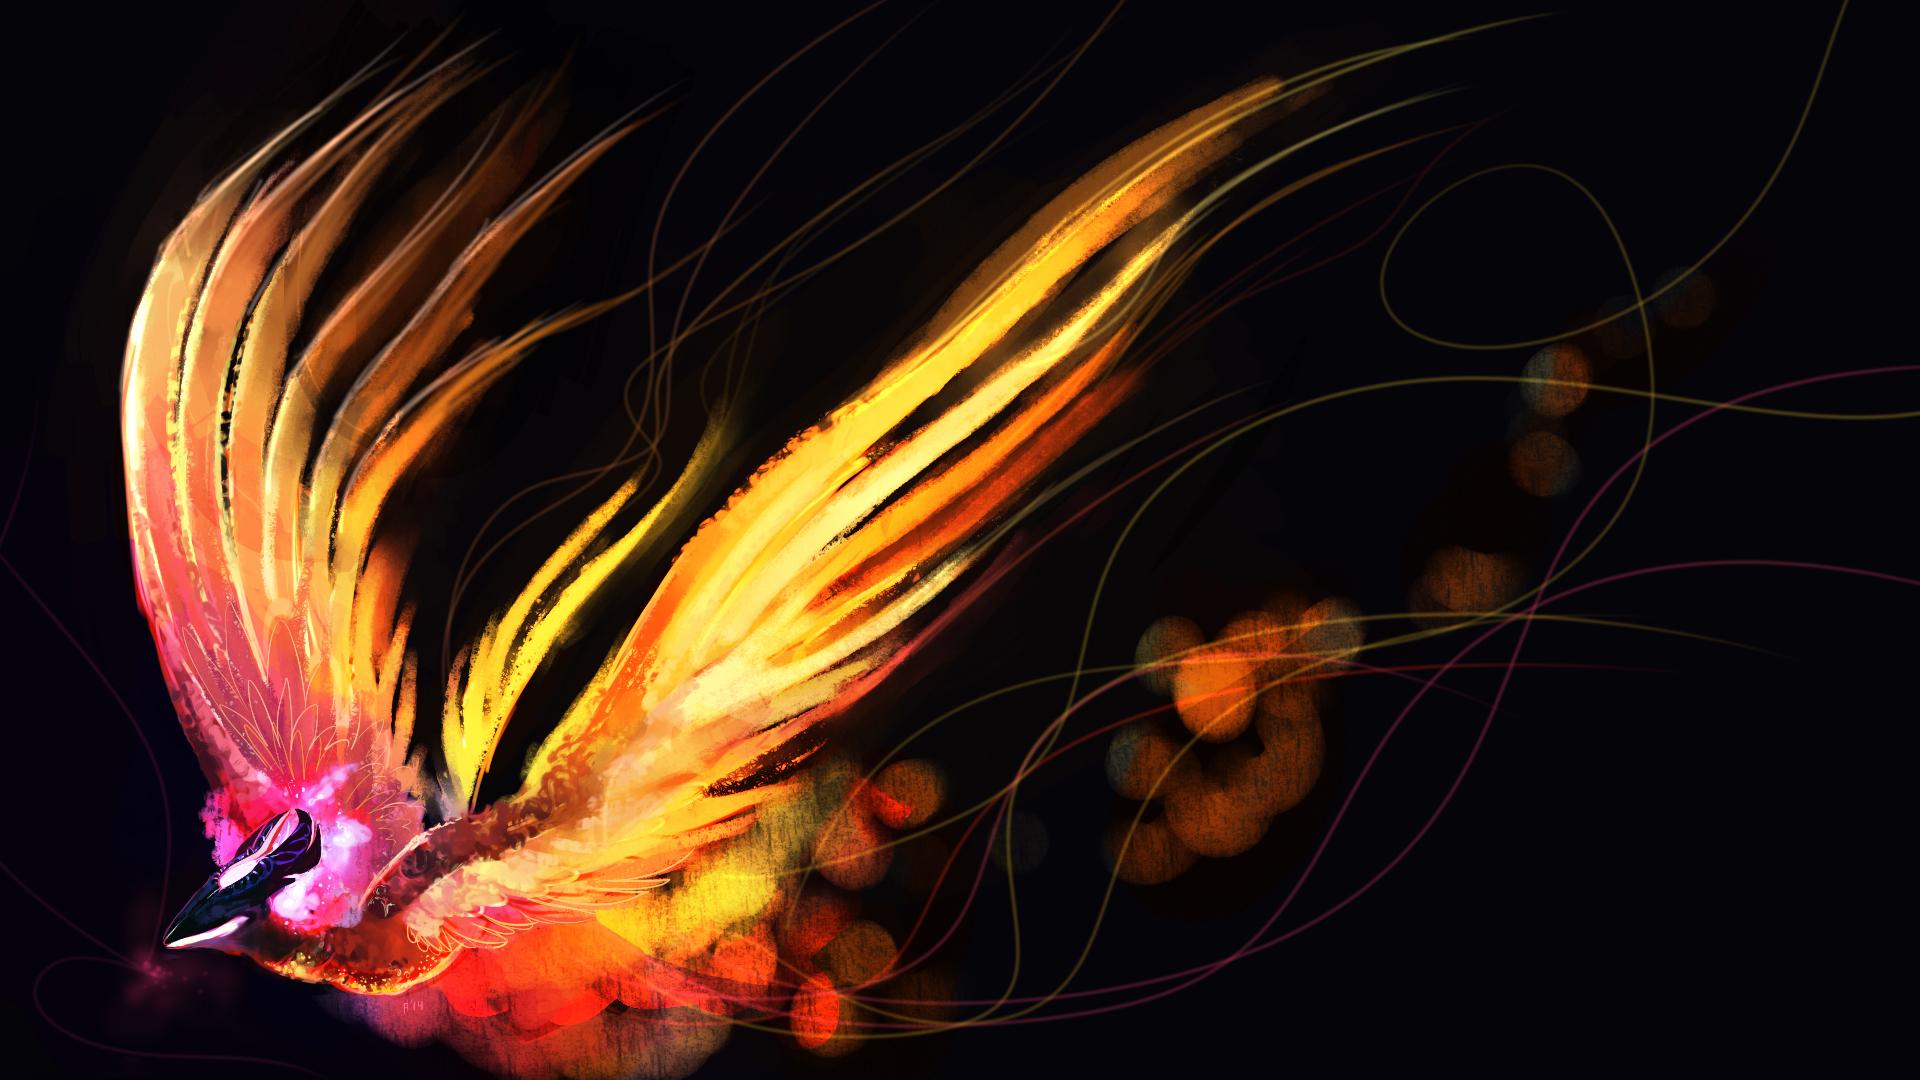 Picture fantasy dota 2 phoenix games phoenix mythology 1920x1080 - Fenix bird hd images ...